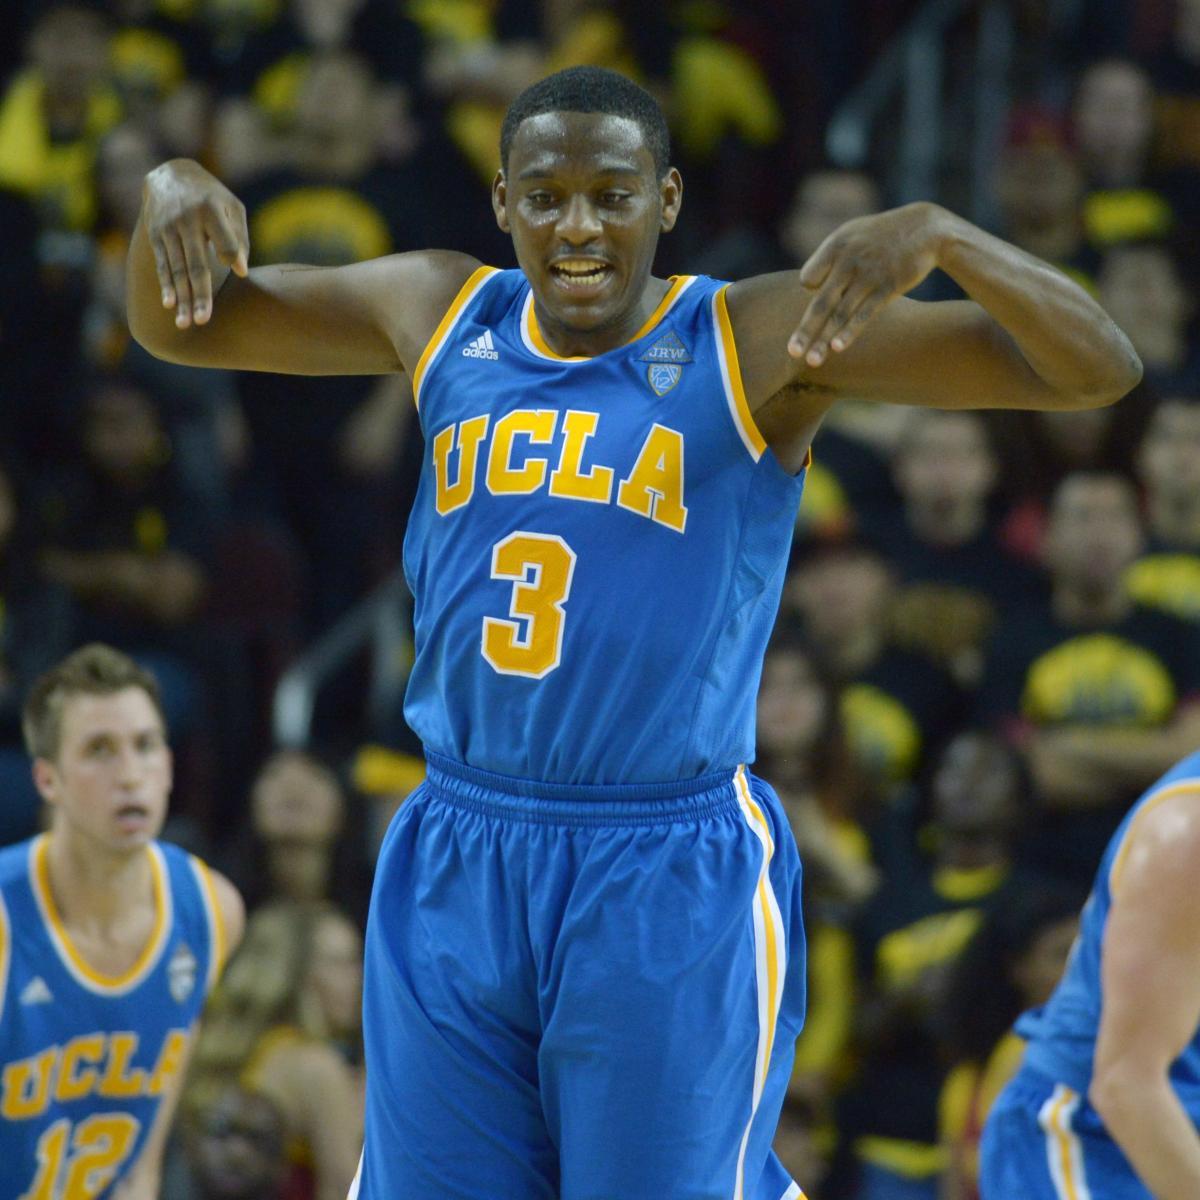 Jordan Adams NBA Draft 2014: Highlights, Scouting Report